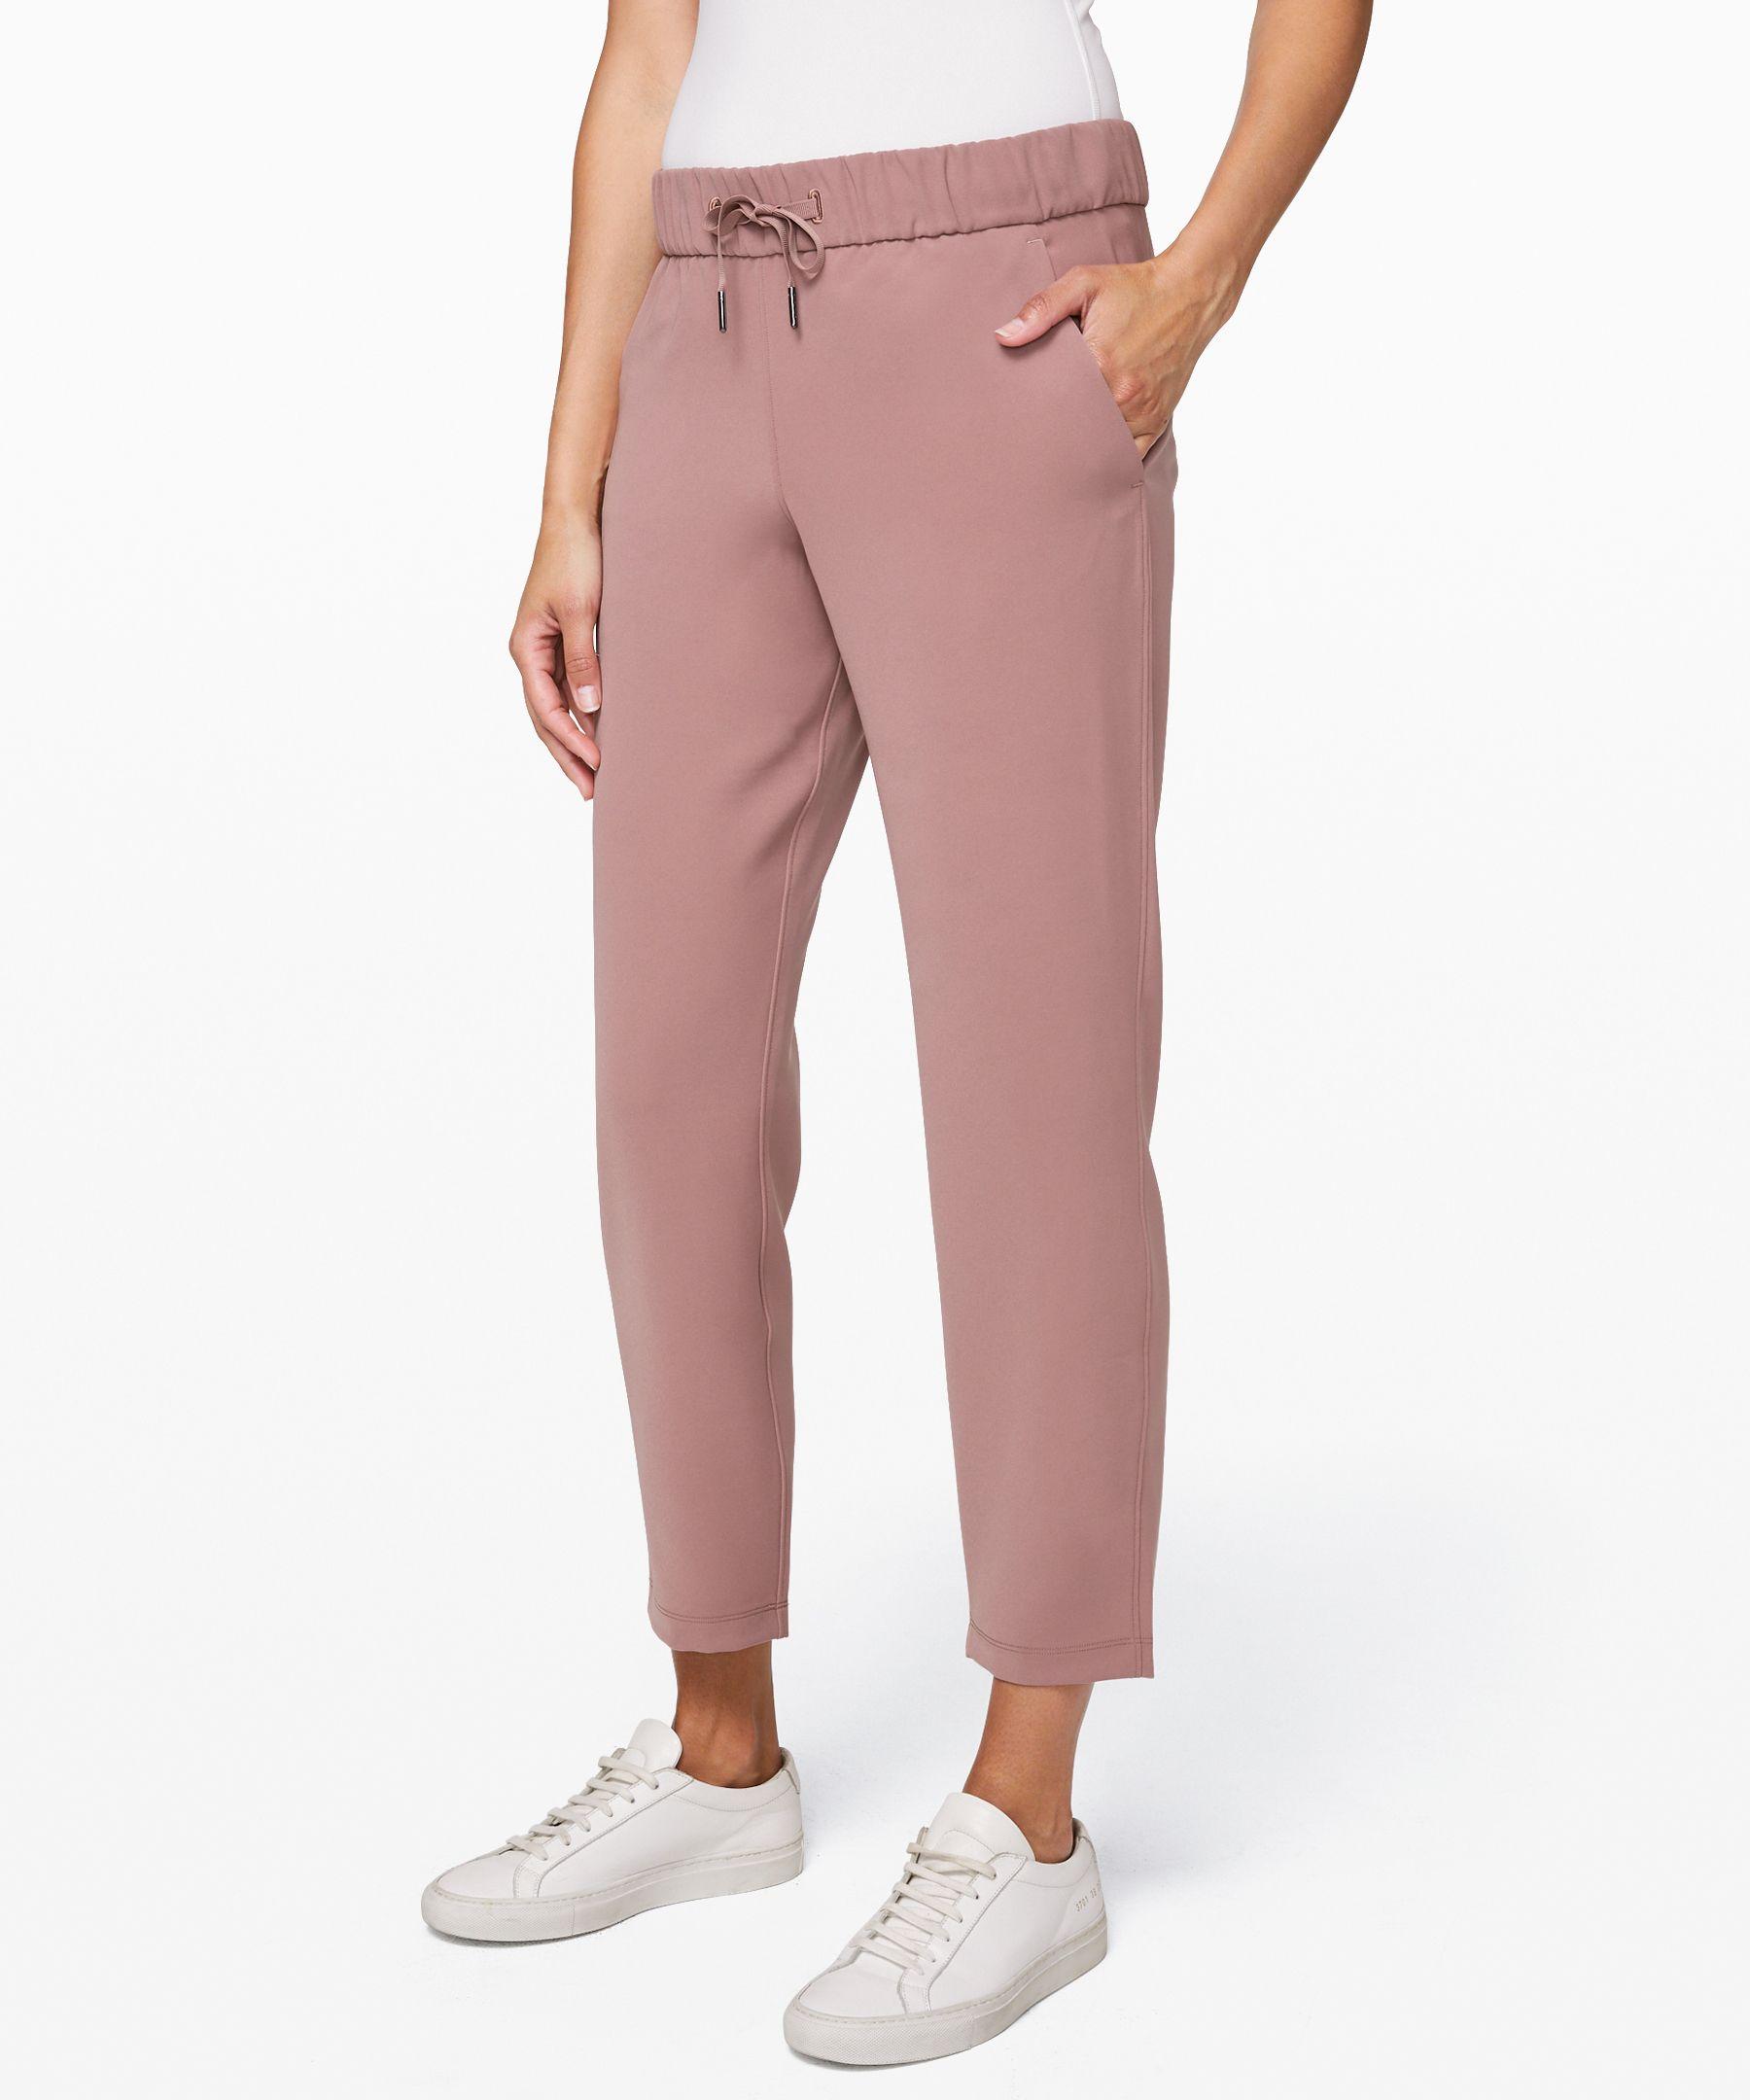 90c15f4e4e On the Fly 7/8 Pant *Woven | Women's Pants | lululemon athletica